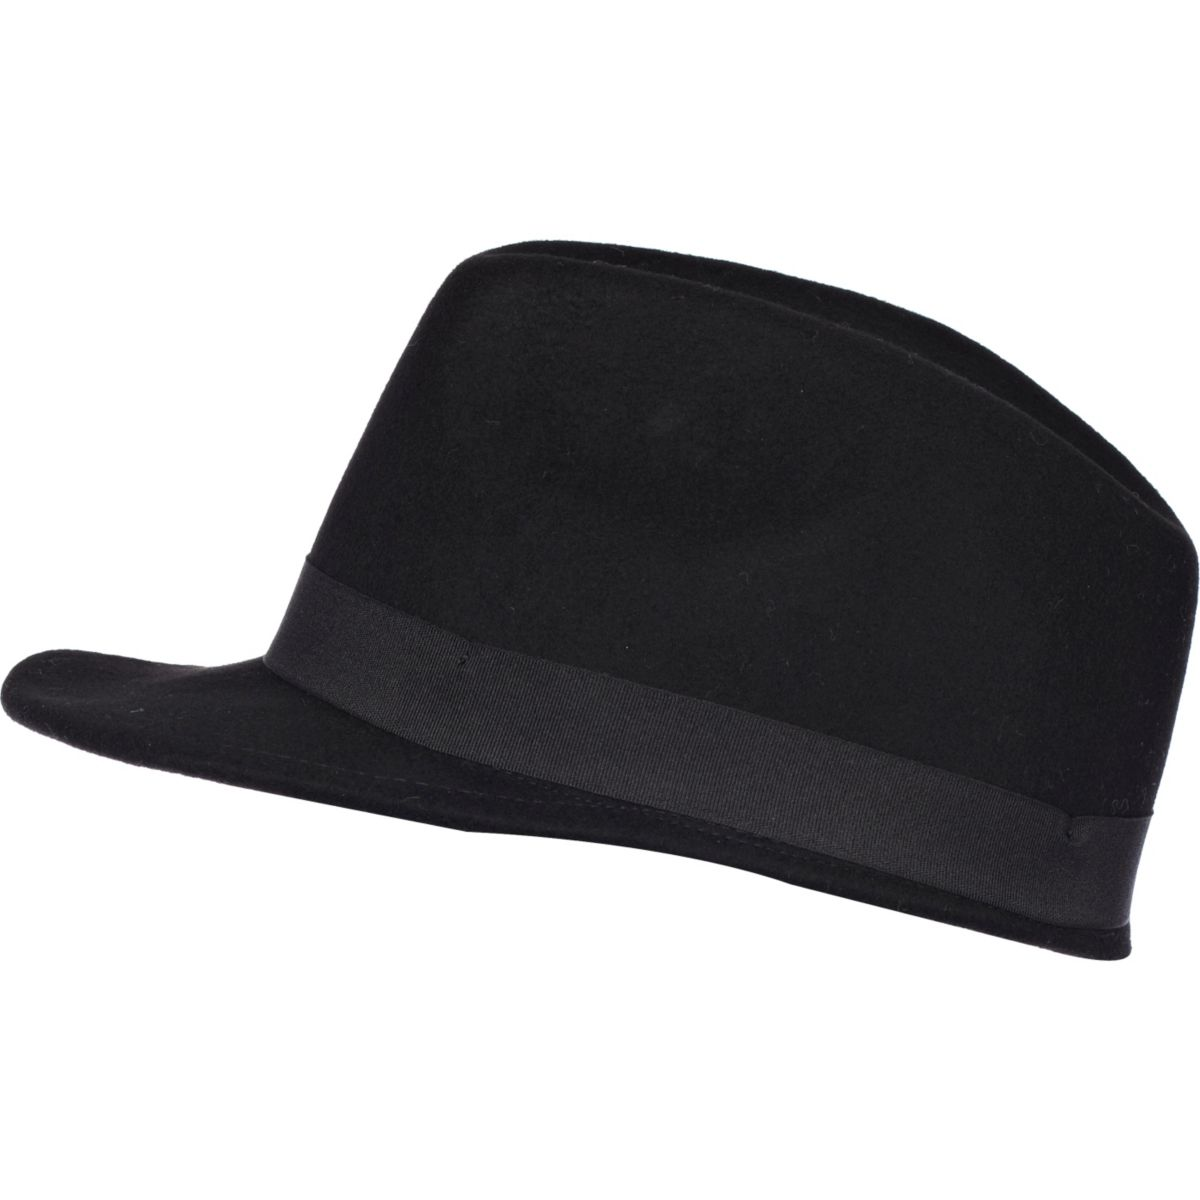 Black felt peak trilby hat